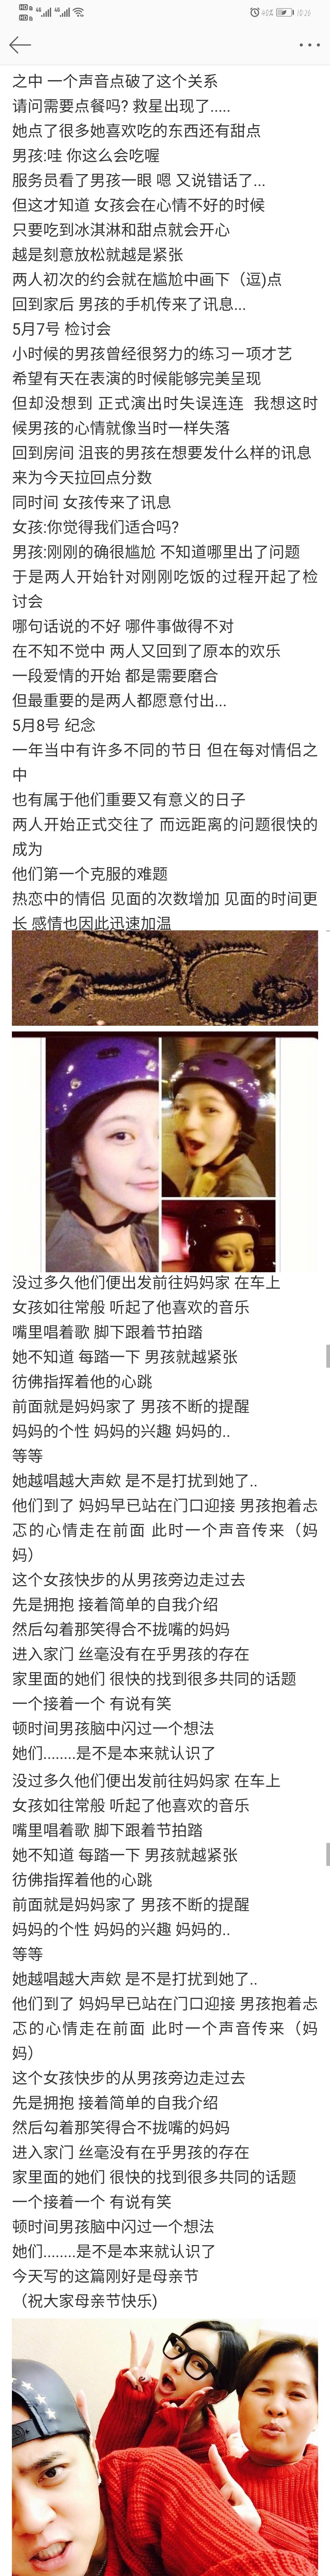 Screenshot_20200520_102655_com.sina.weibo_80293764683059.jpg